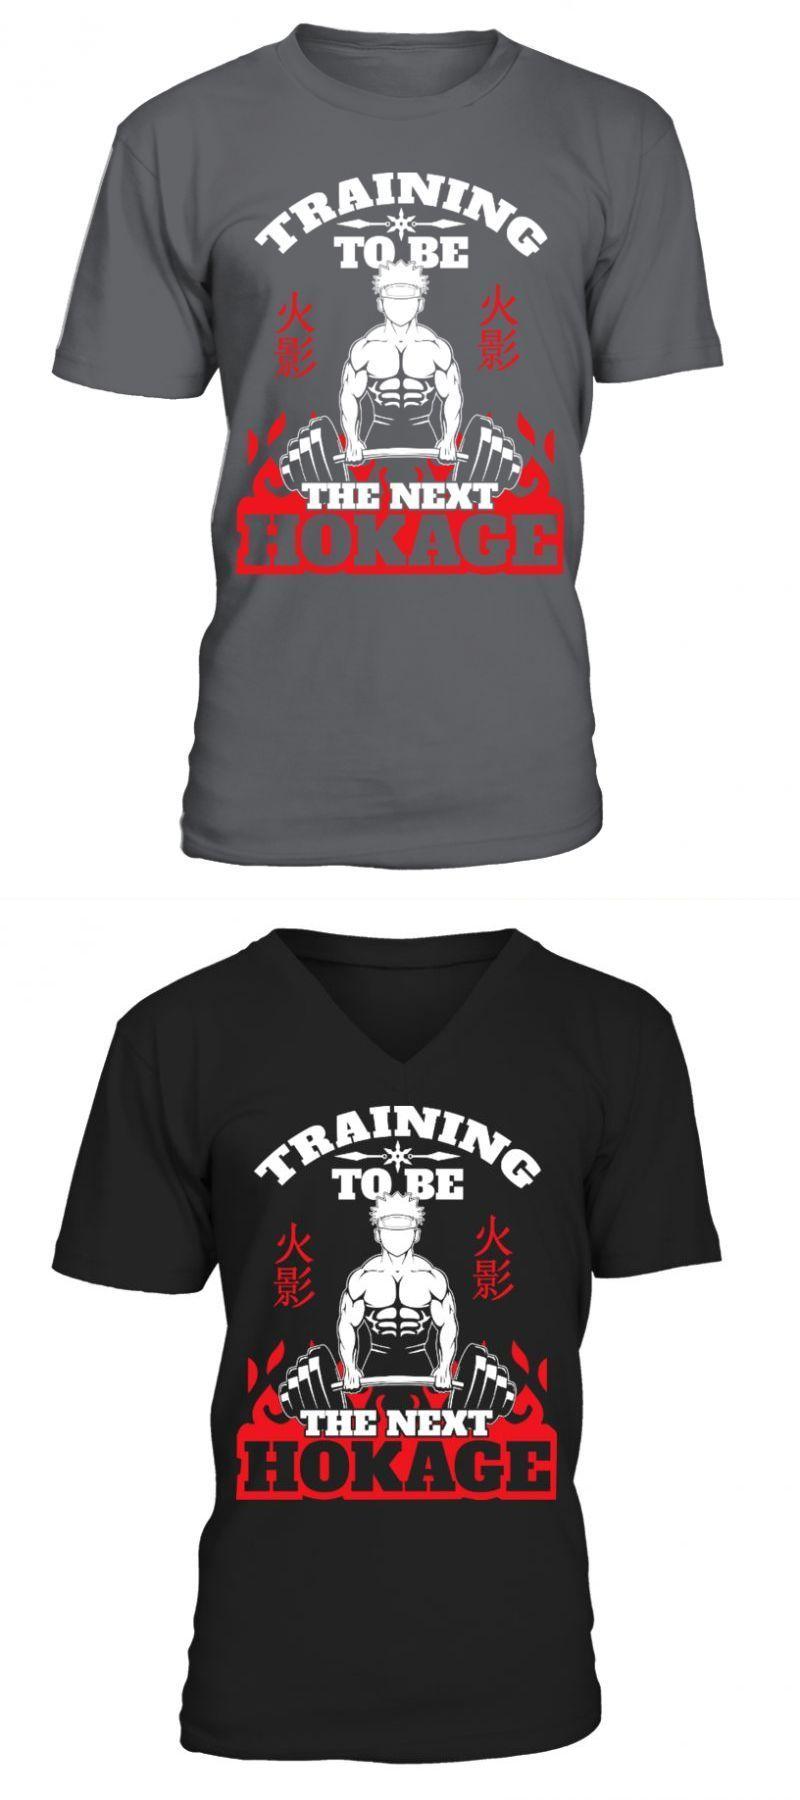 f37e555b1a58 T shirt fitness superman training to be the next hokage t shirt fitness nike   shirt  fitness  superman  training  to  be  the  next  hokage  nike  gym  ...